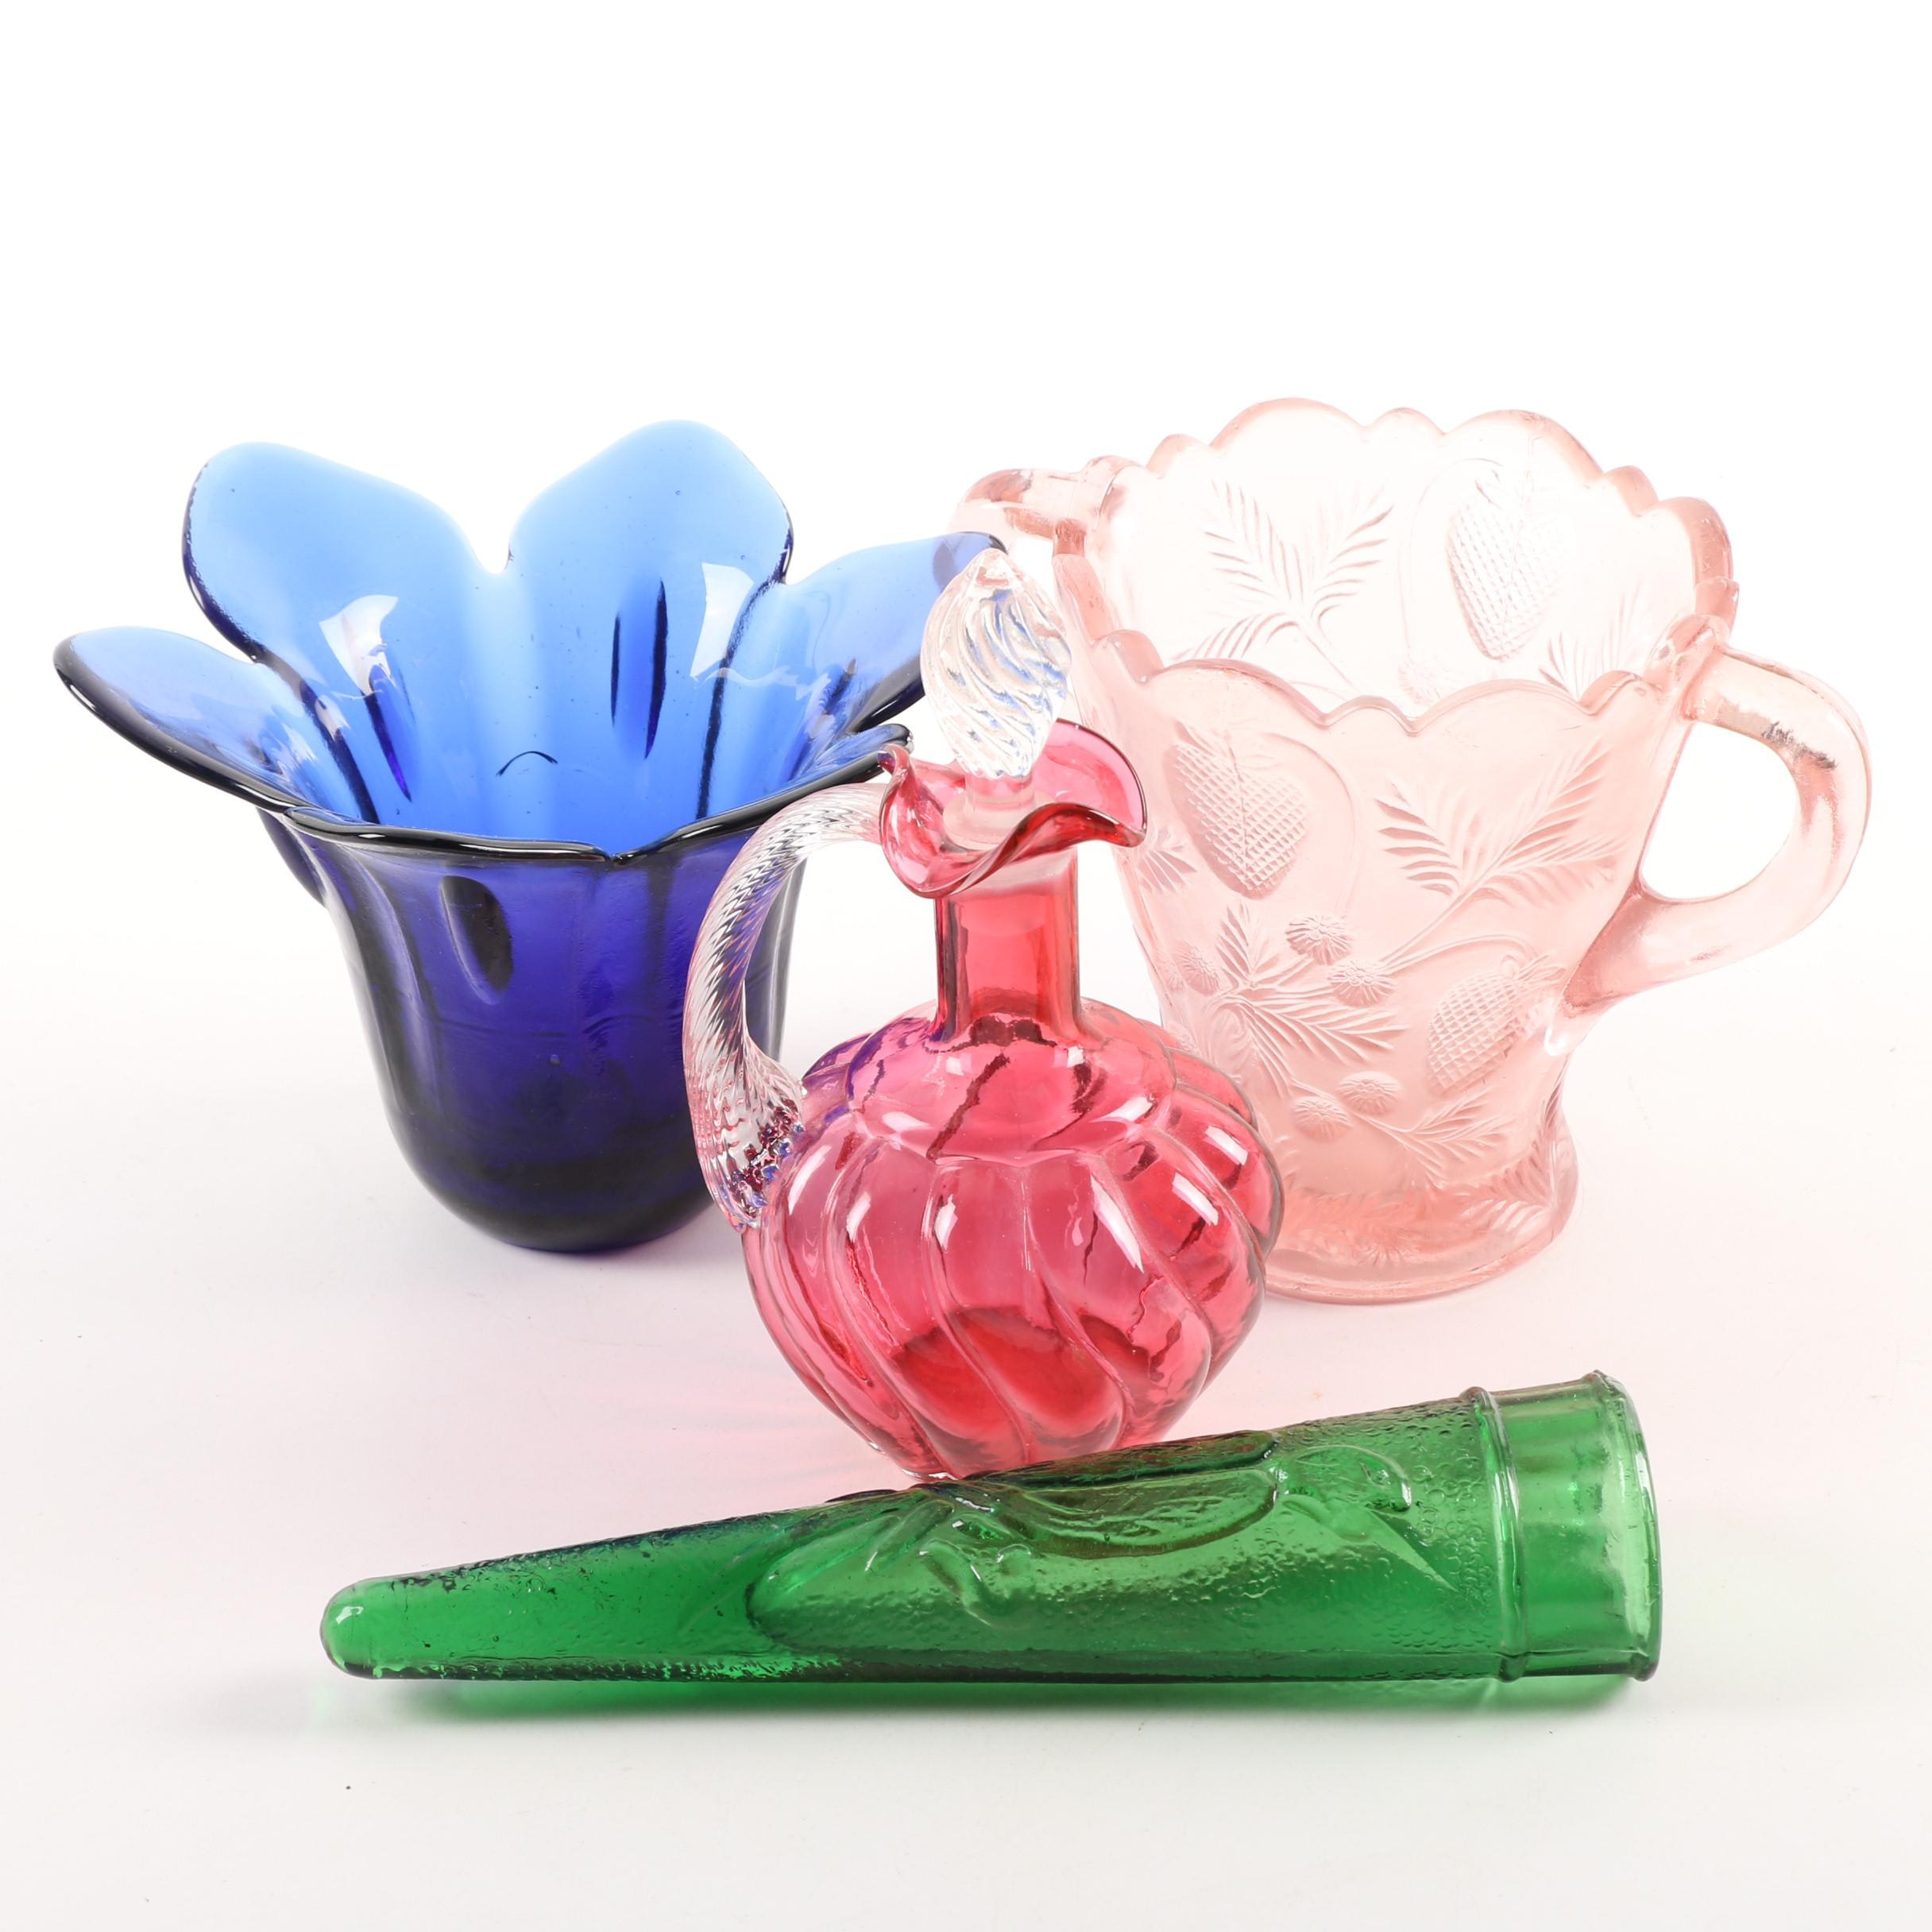 Pink Depression Glass Pitcher, Wall Pocket Bud Vase, Cruet, and Candleholder